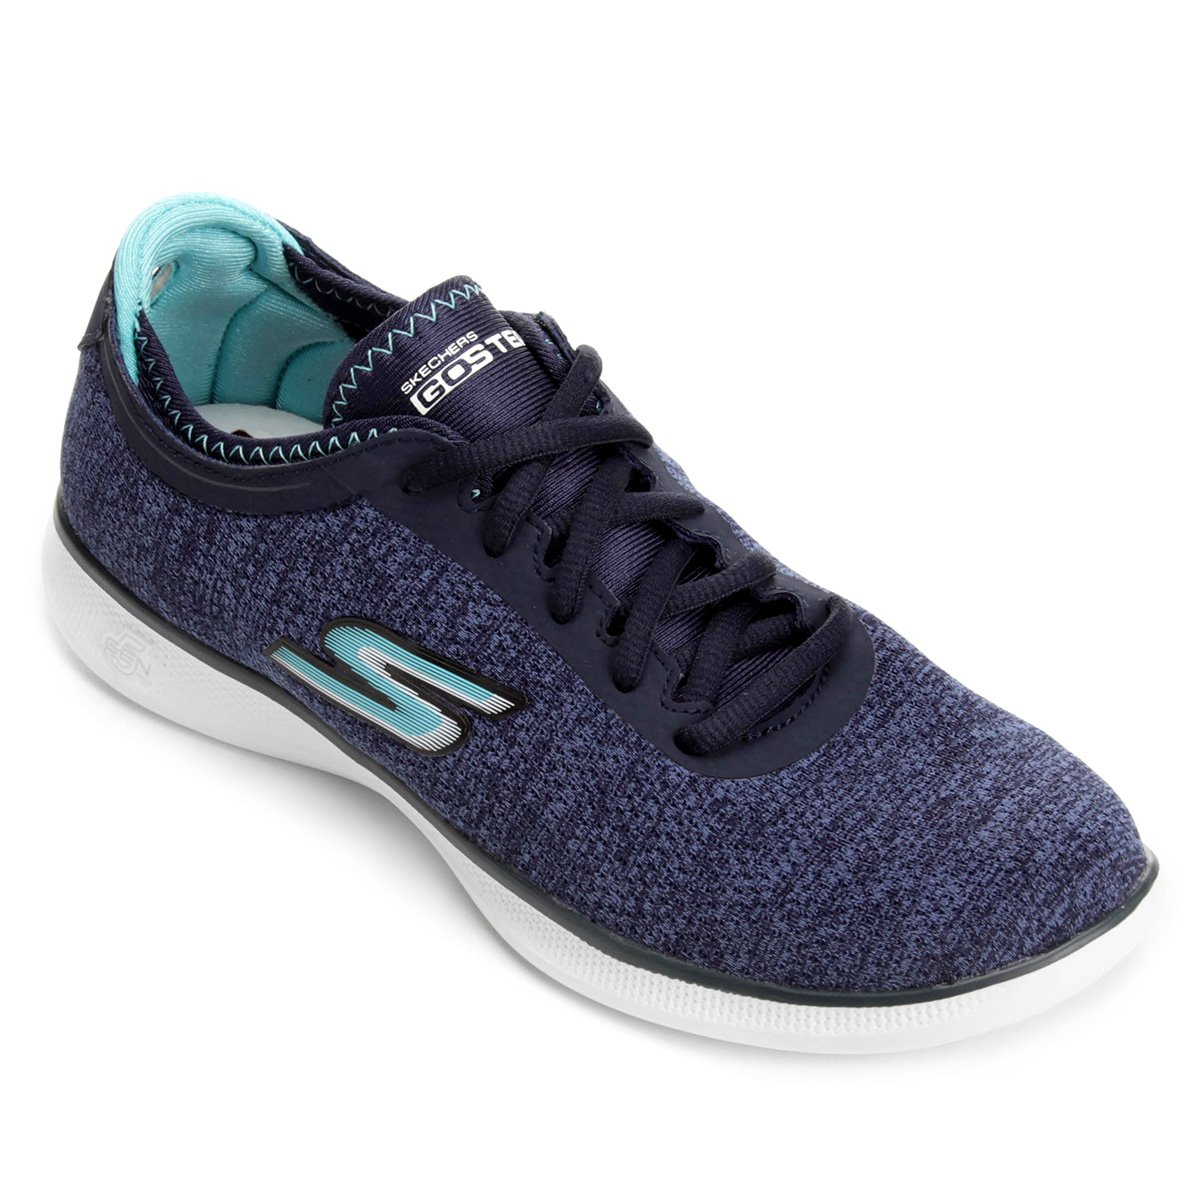 ee2d73ec2e Tênis Skechers Go Step Lite Agile Feminino - Azul Escuro - Compre ...